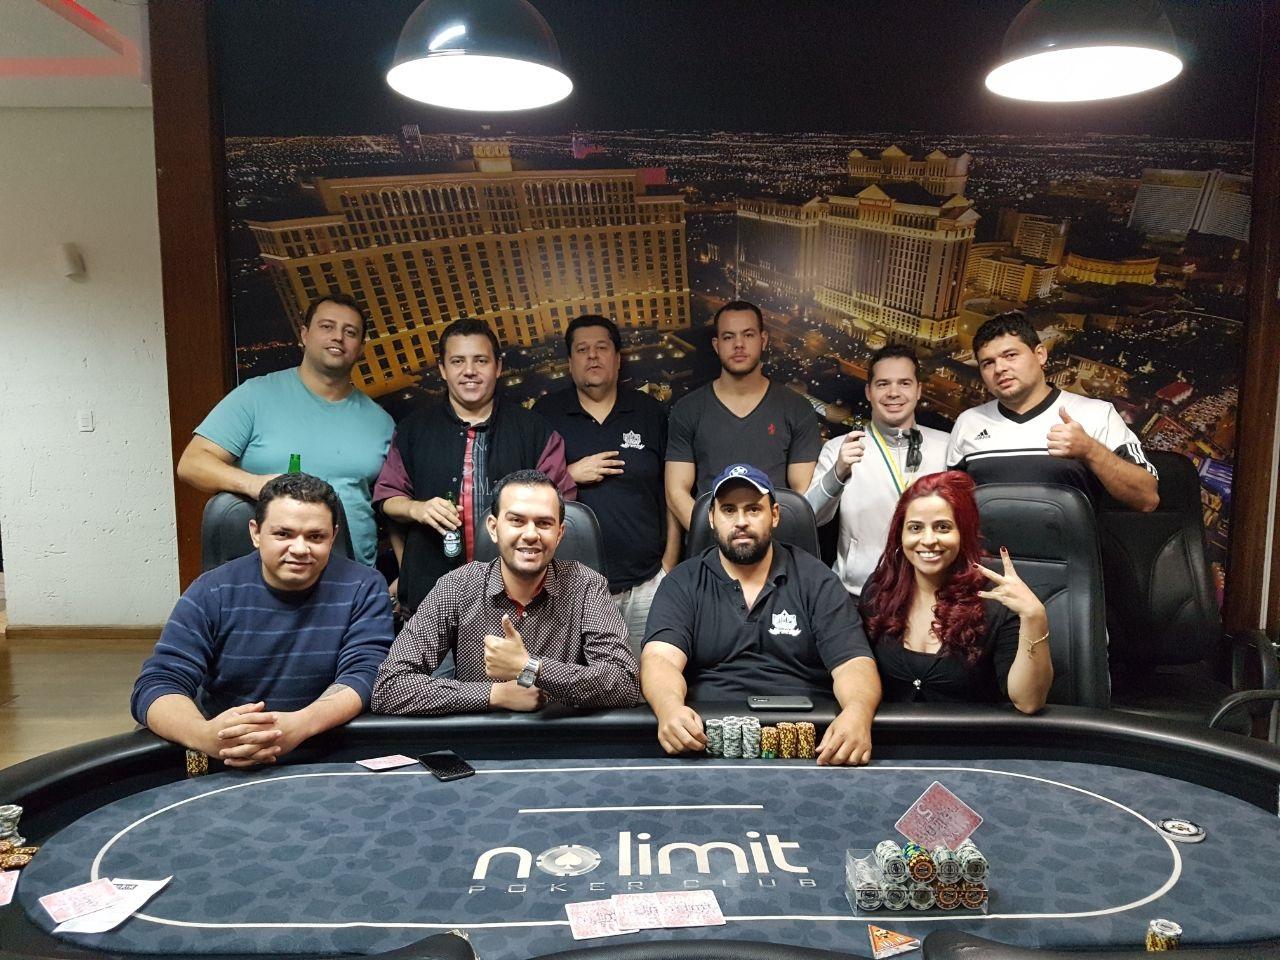 22 poker club ploumagoar